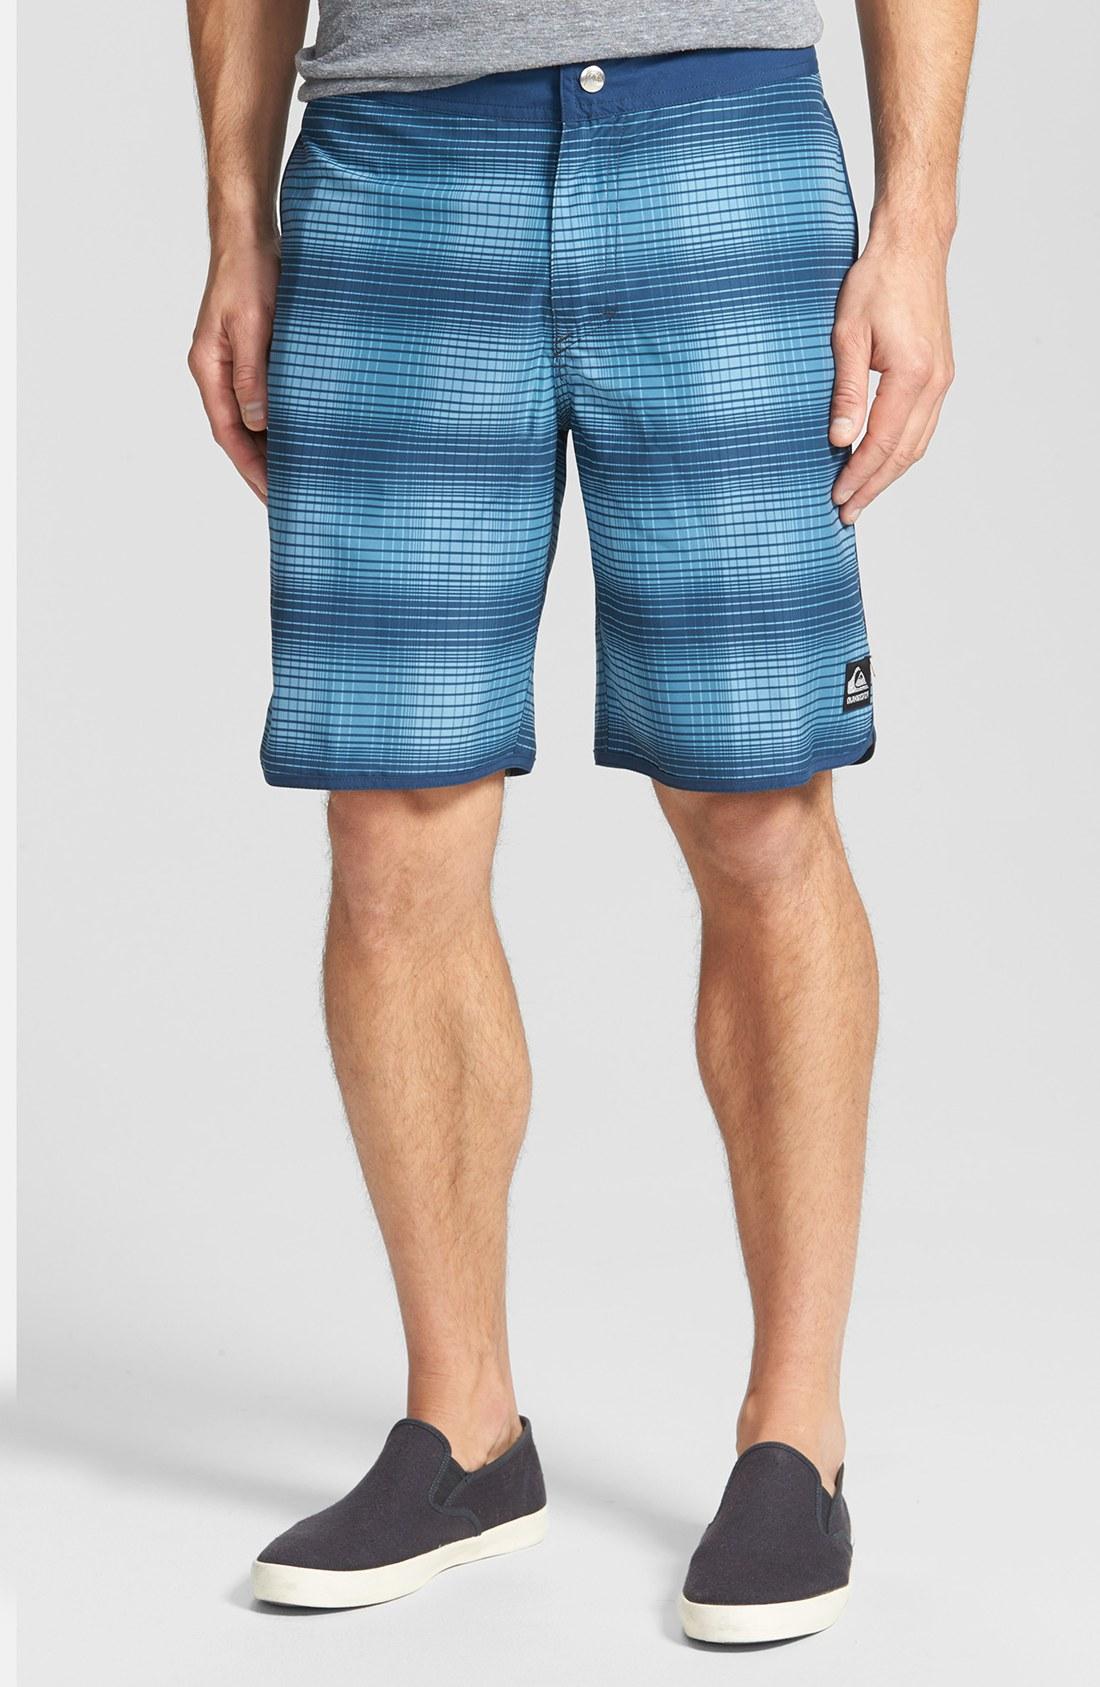 Quiksilver Quicksilver Scallopuss Board Shorts In Blue For